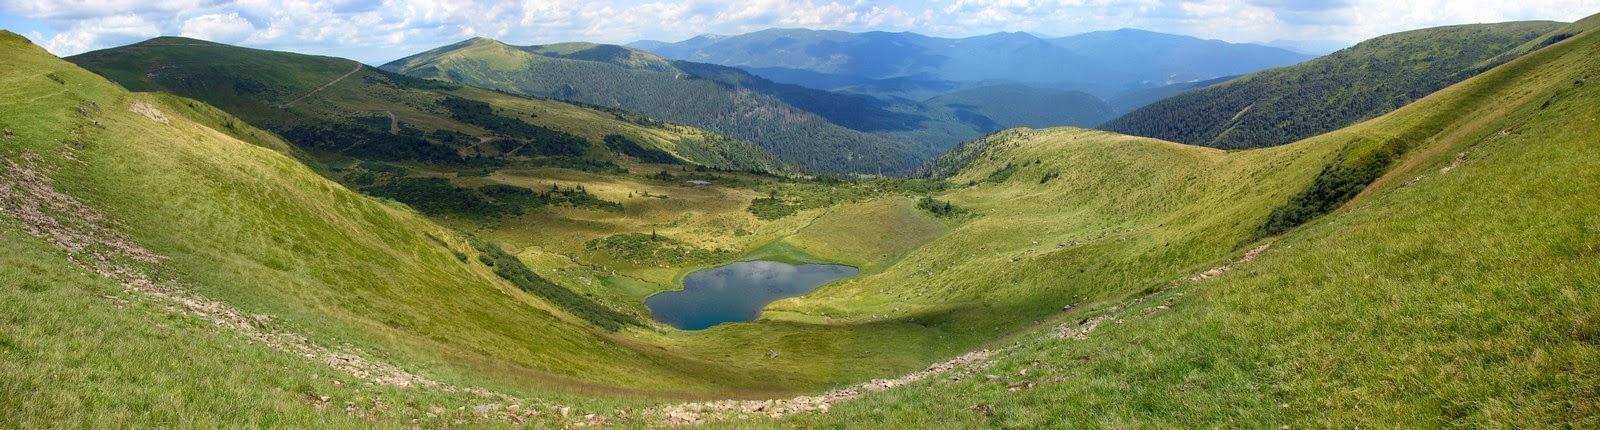 Панорама гор вокруг озера Апшинец